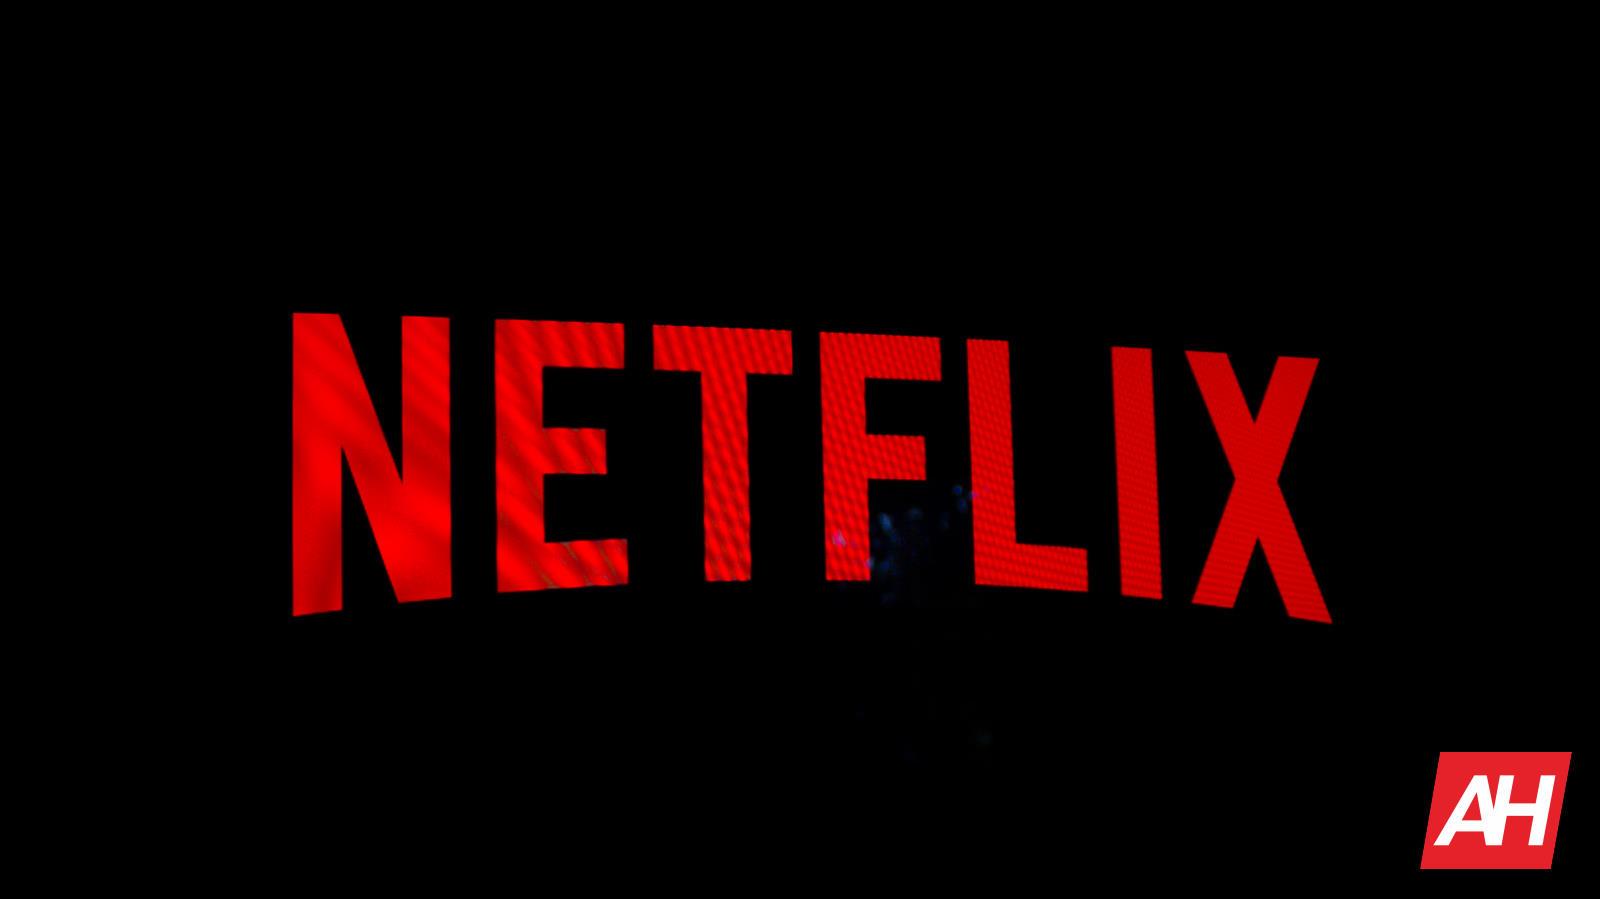 Netflix Confident Disney+ Won't Be Competition, But Is That True?